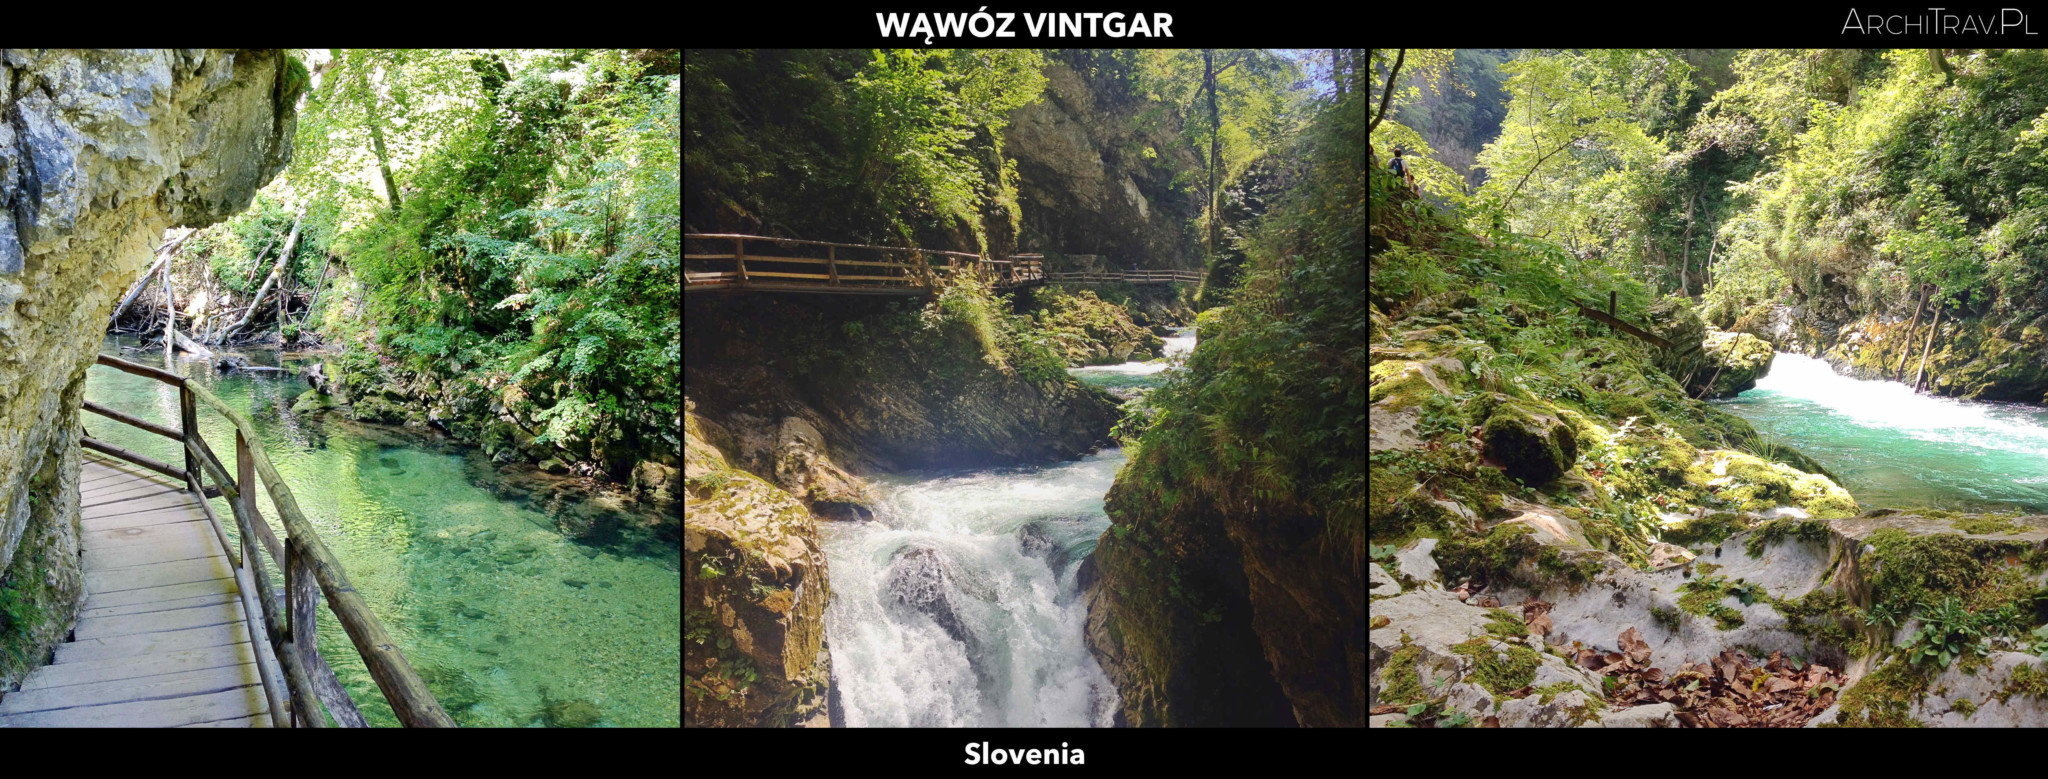 Slowenia wawoz vintgar